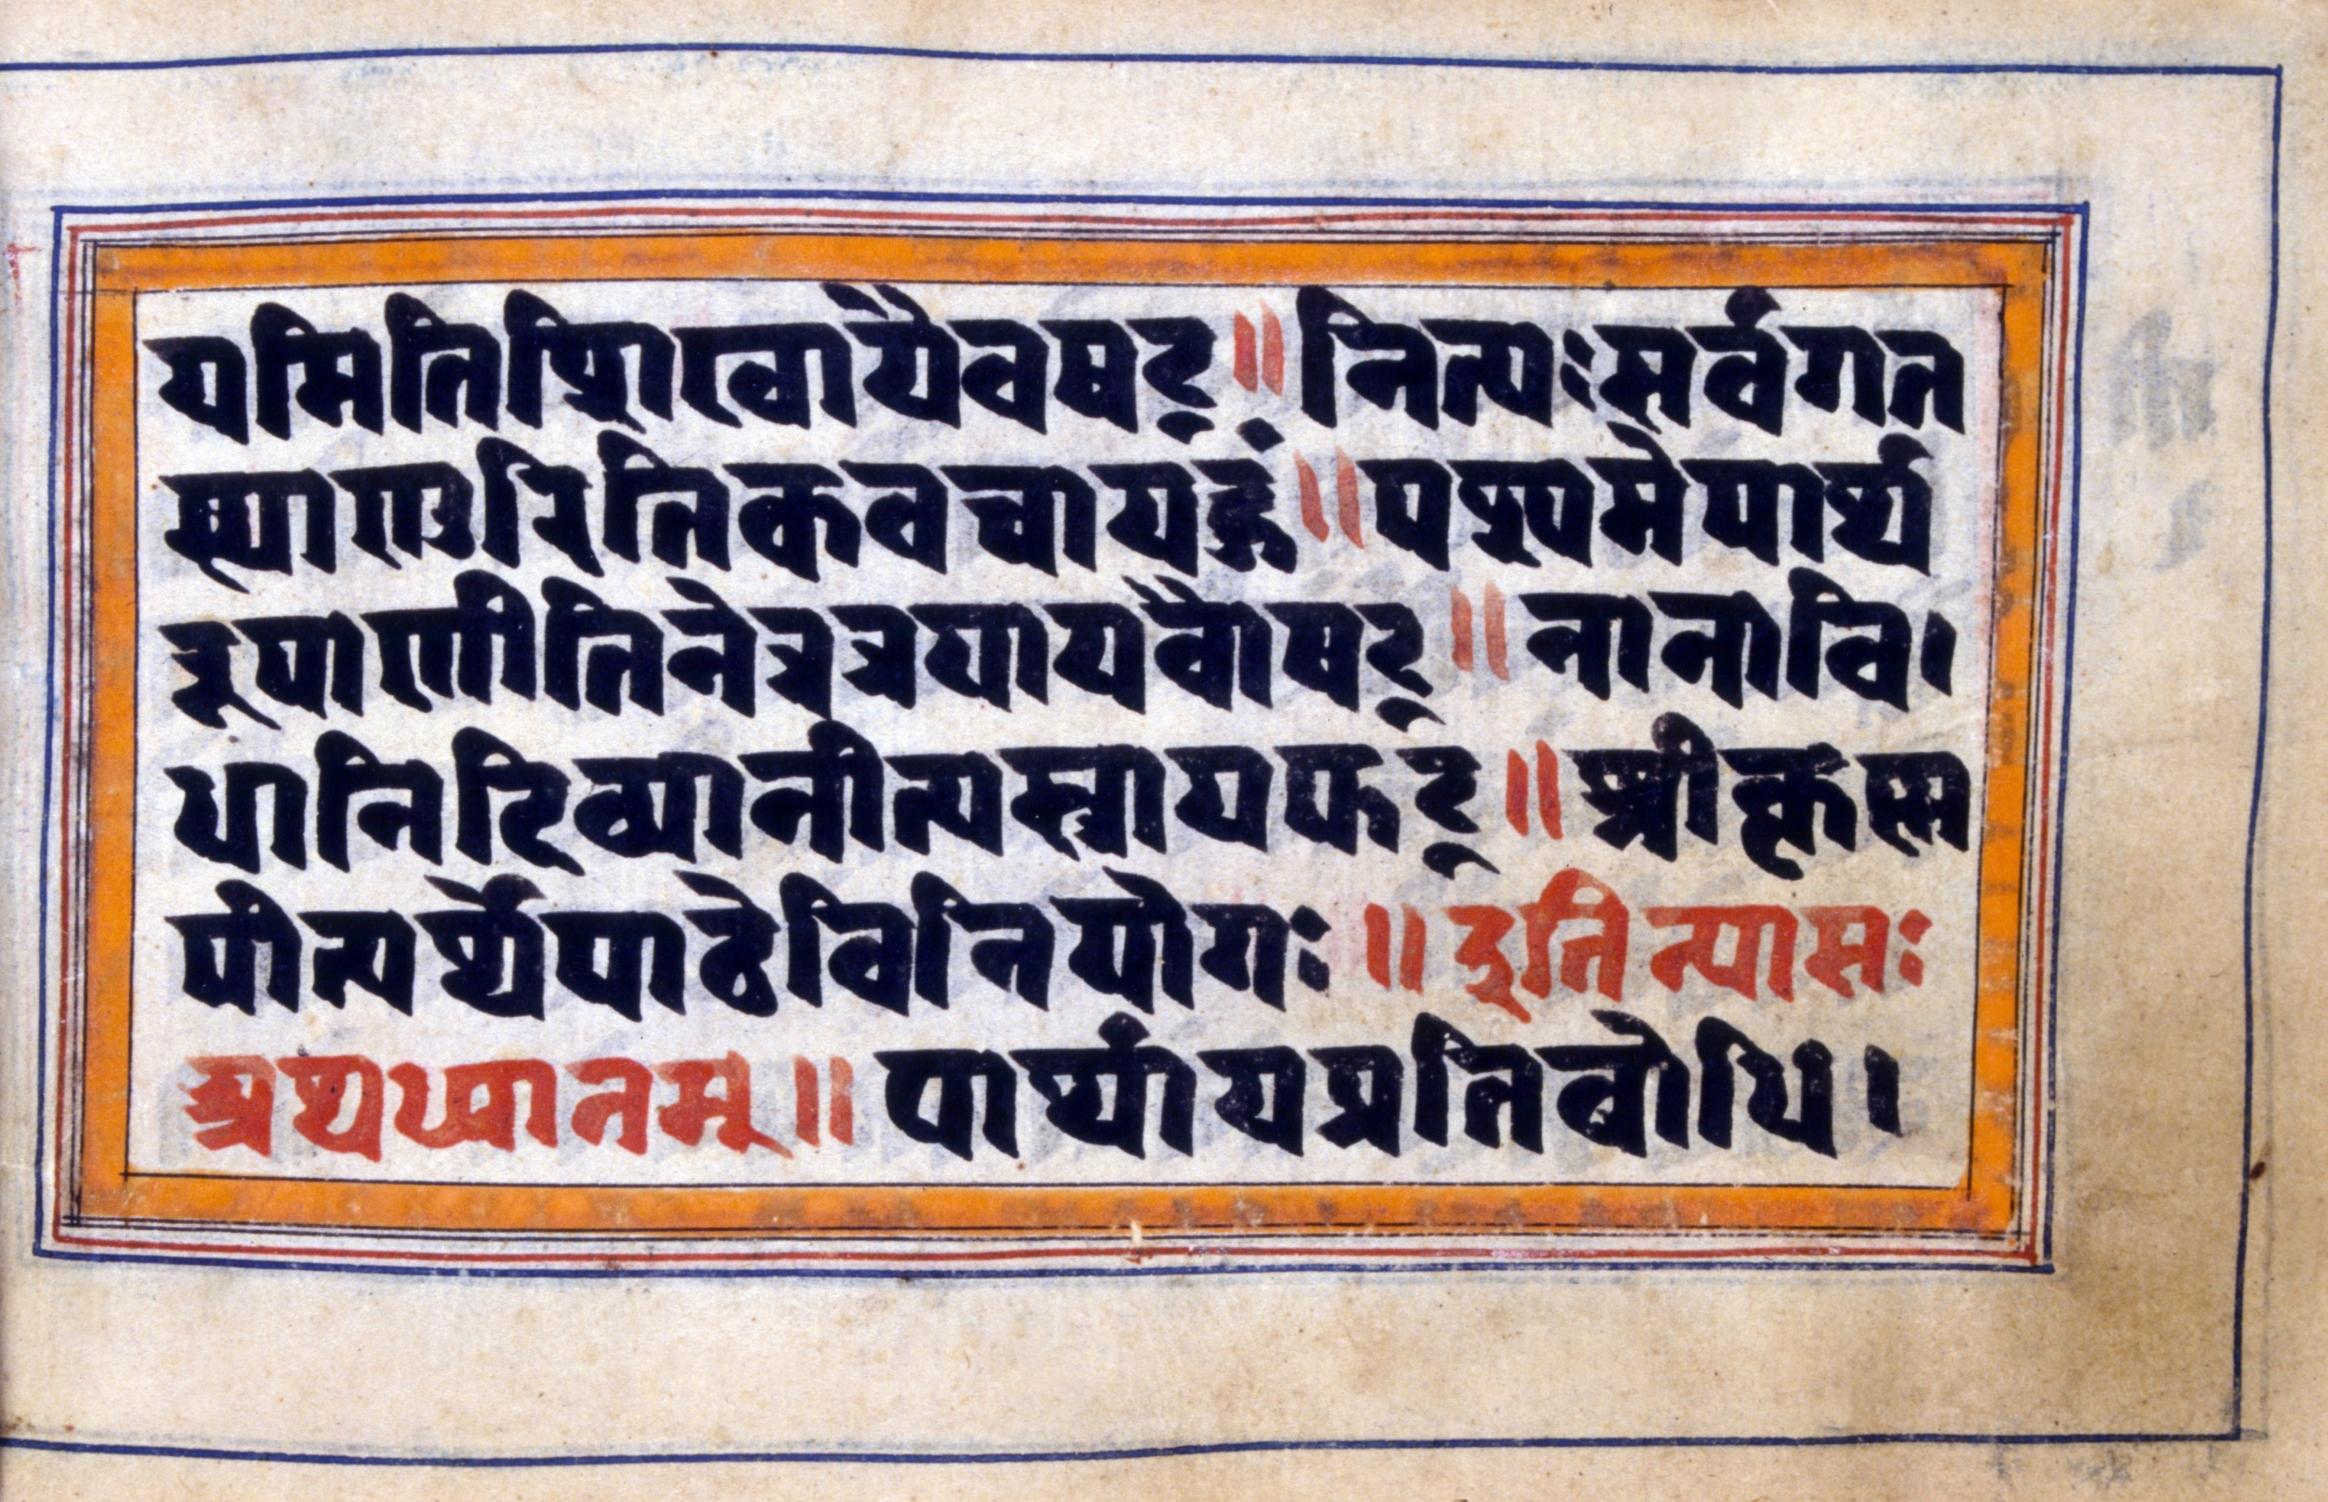 how to speak tamil through hindi